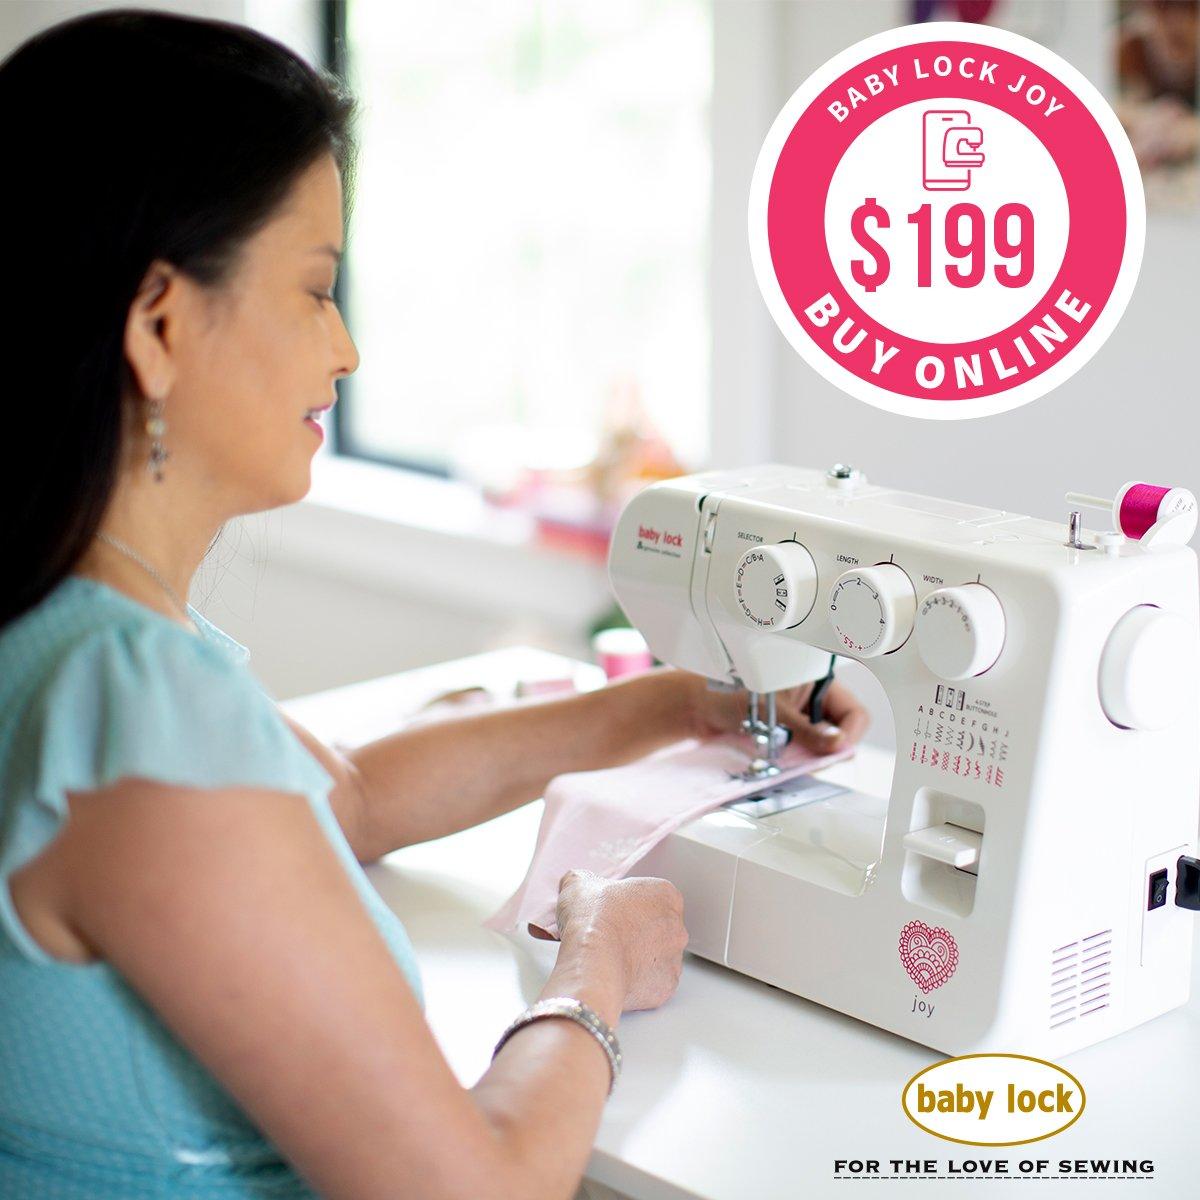 Joy Babylock Sewing Machine